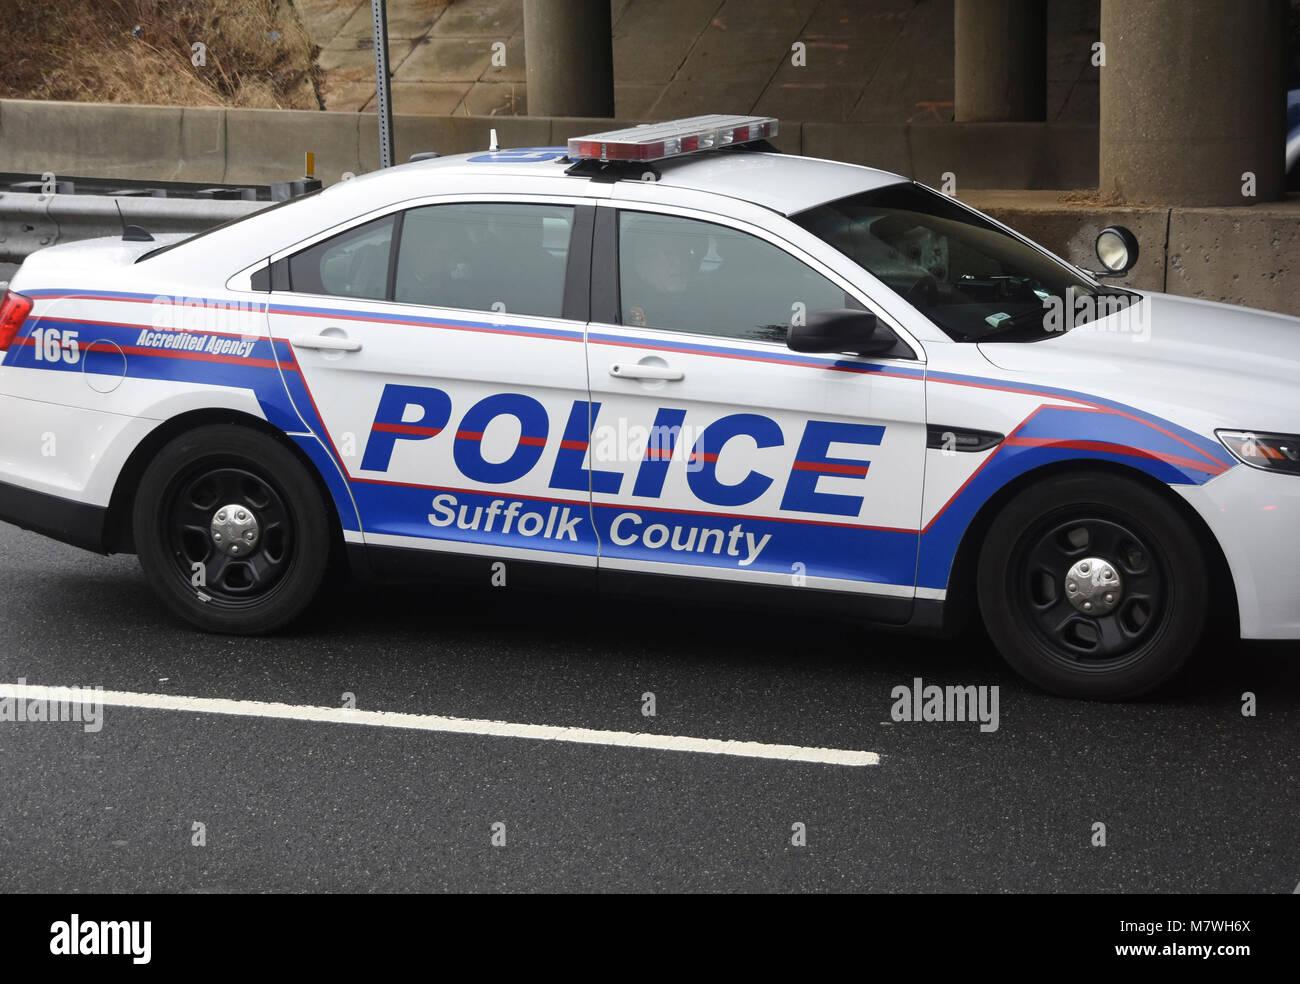 Suffolk County Police car Stock Photo